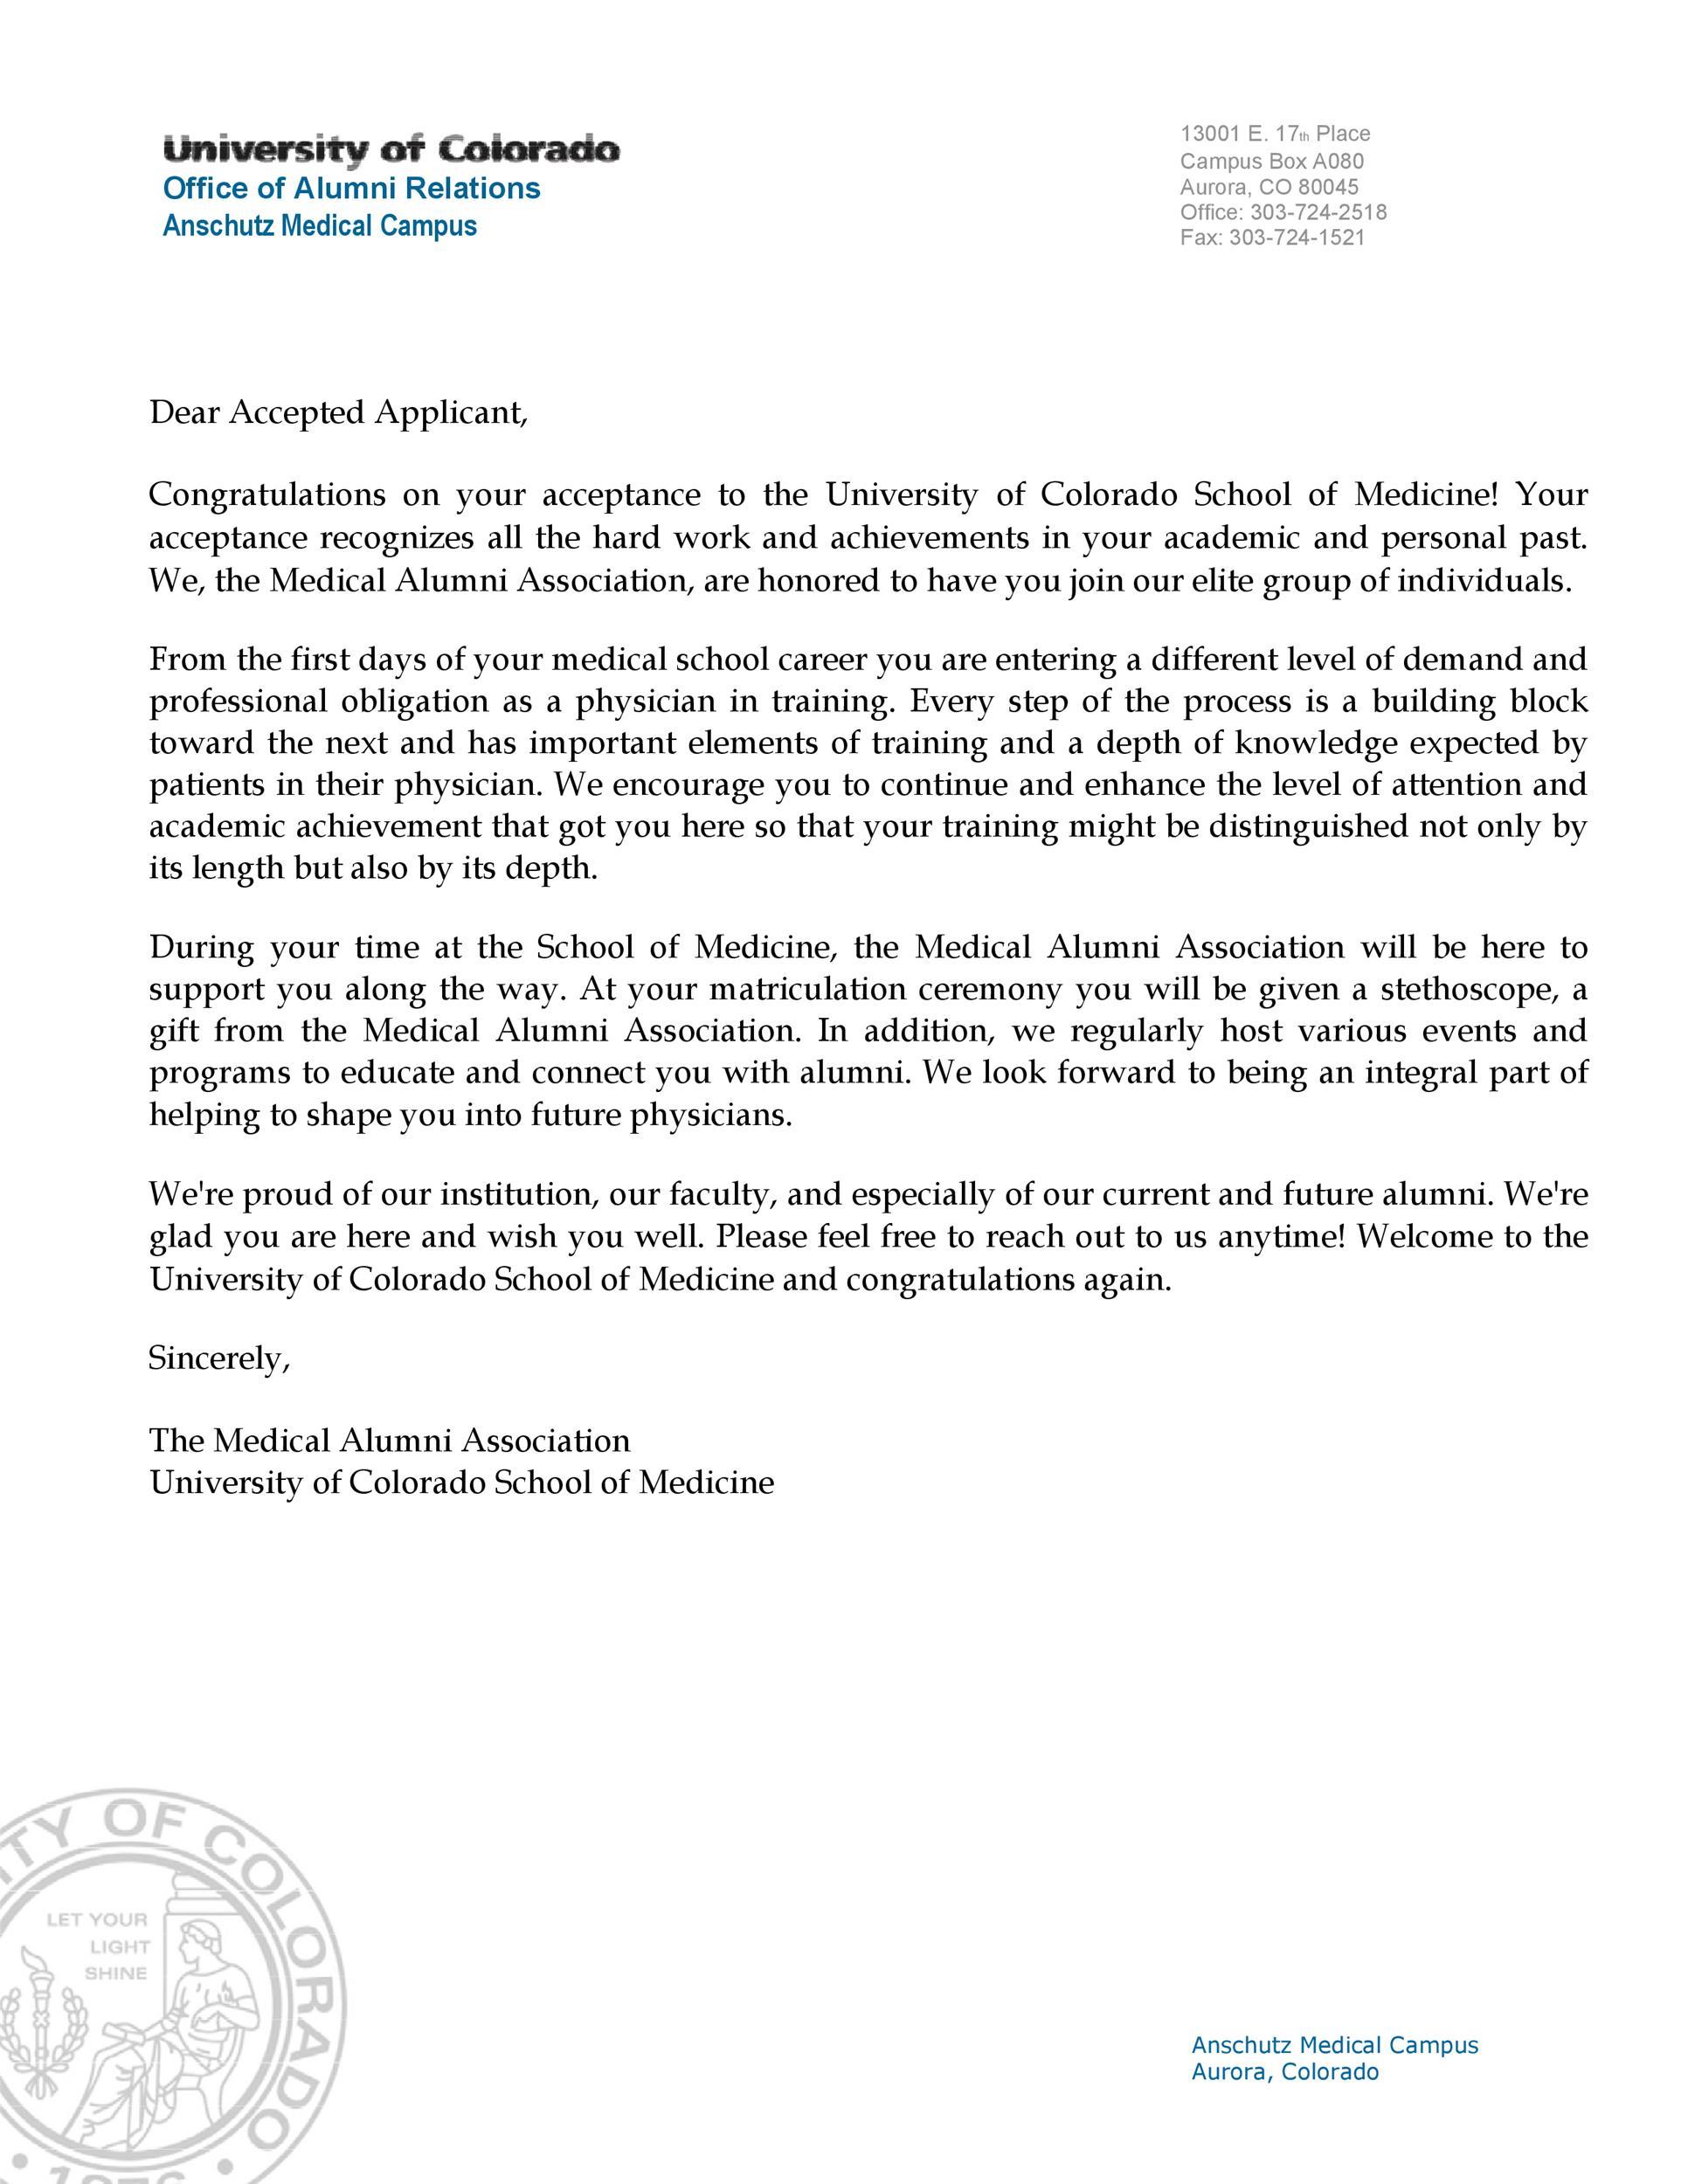 Free congratulations letter 17